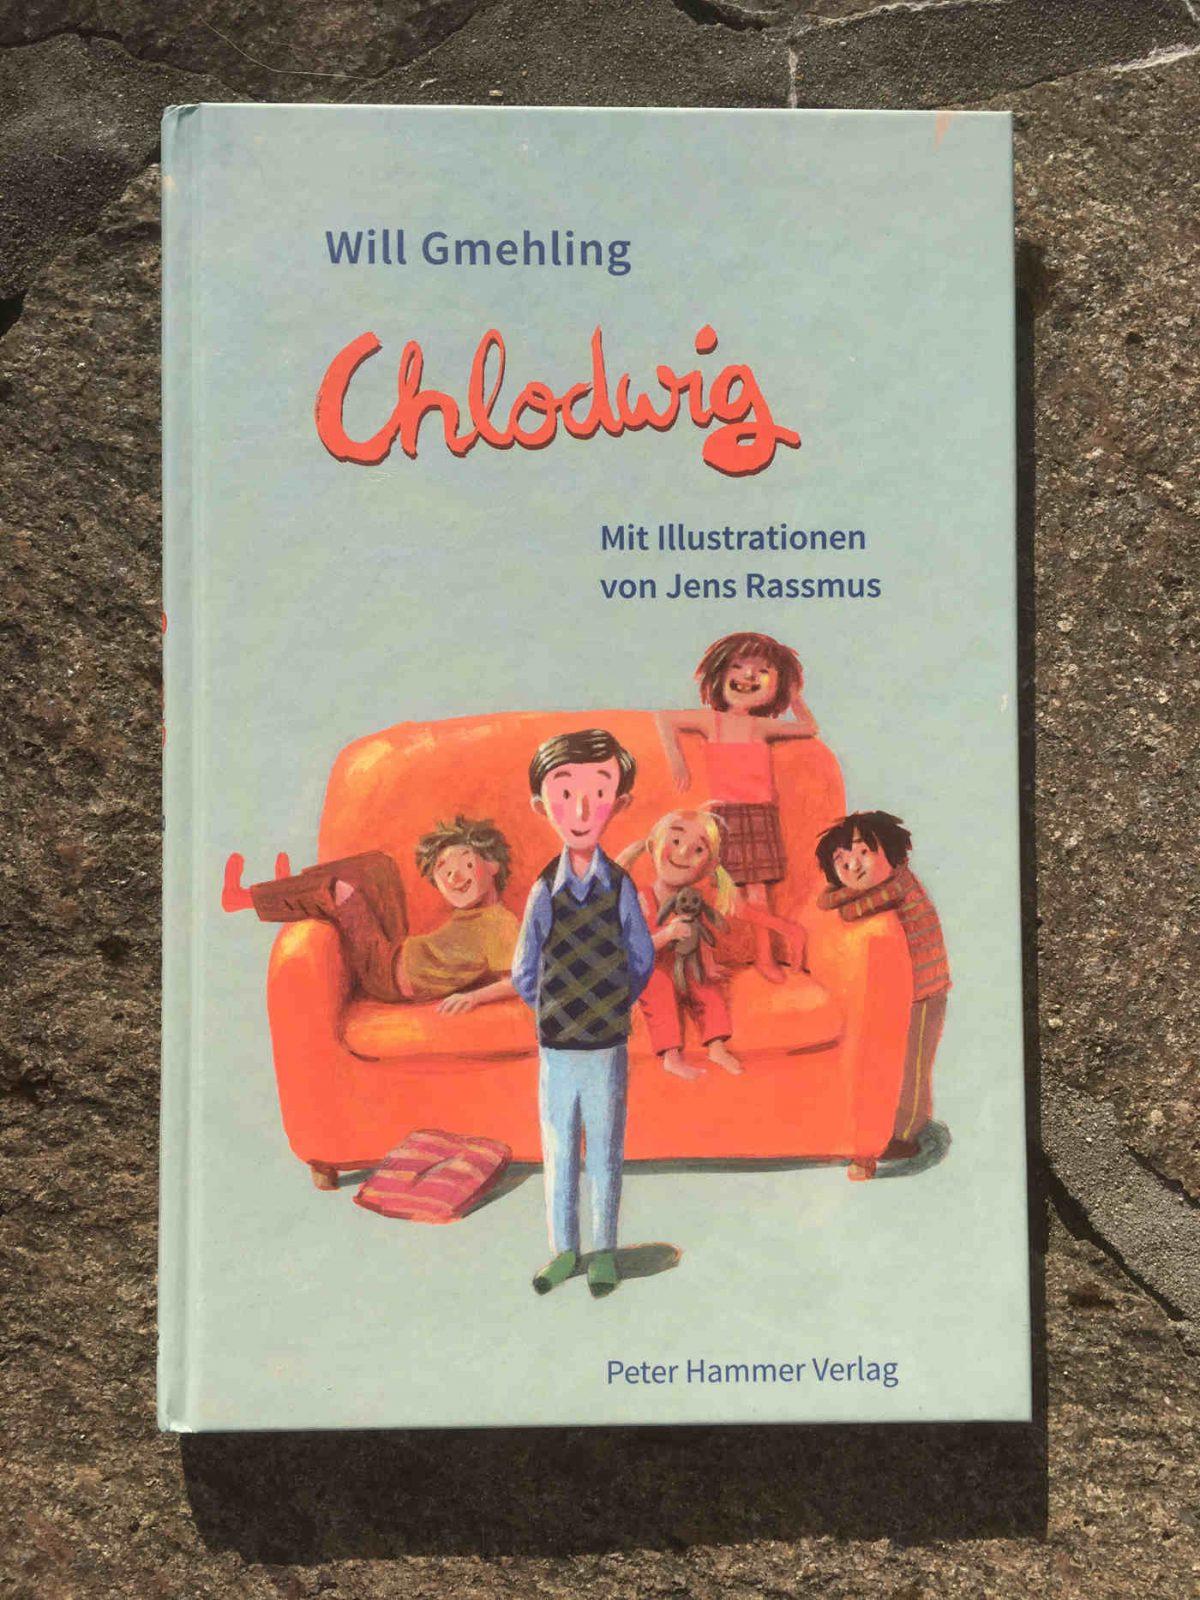 Will Gmehling und Jens Rassmus: Chlodwig